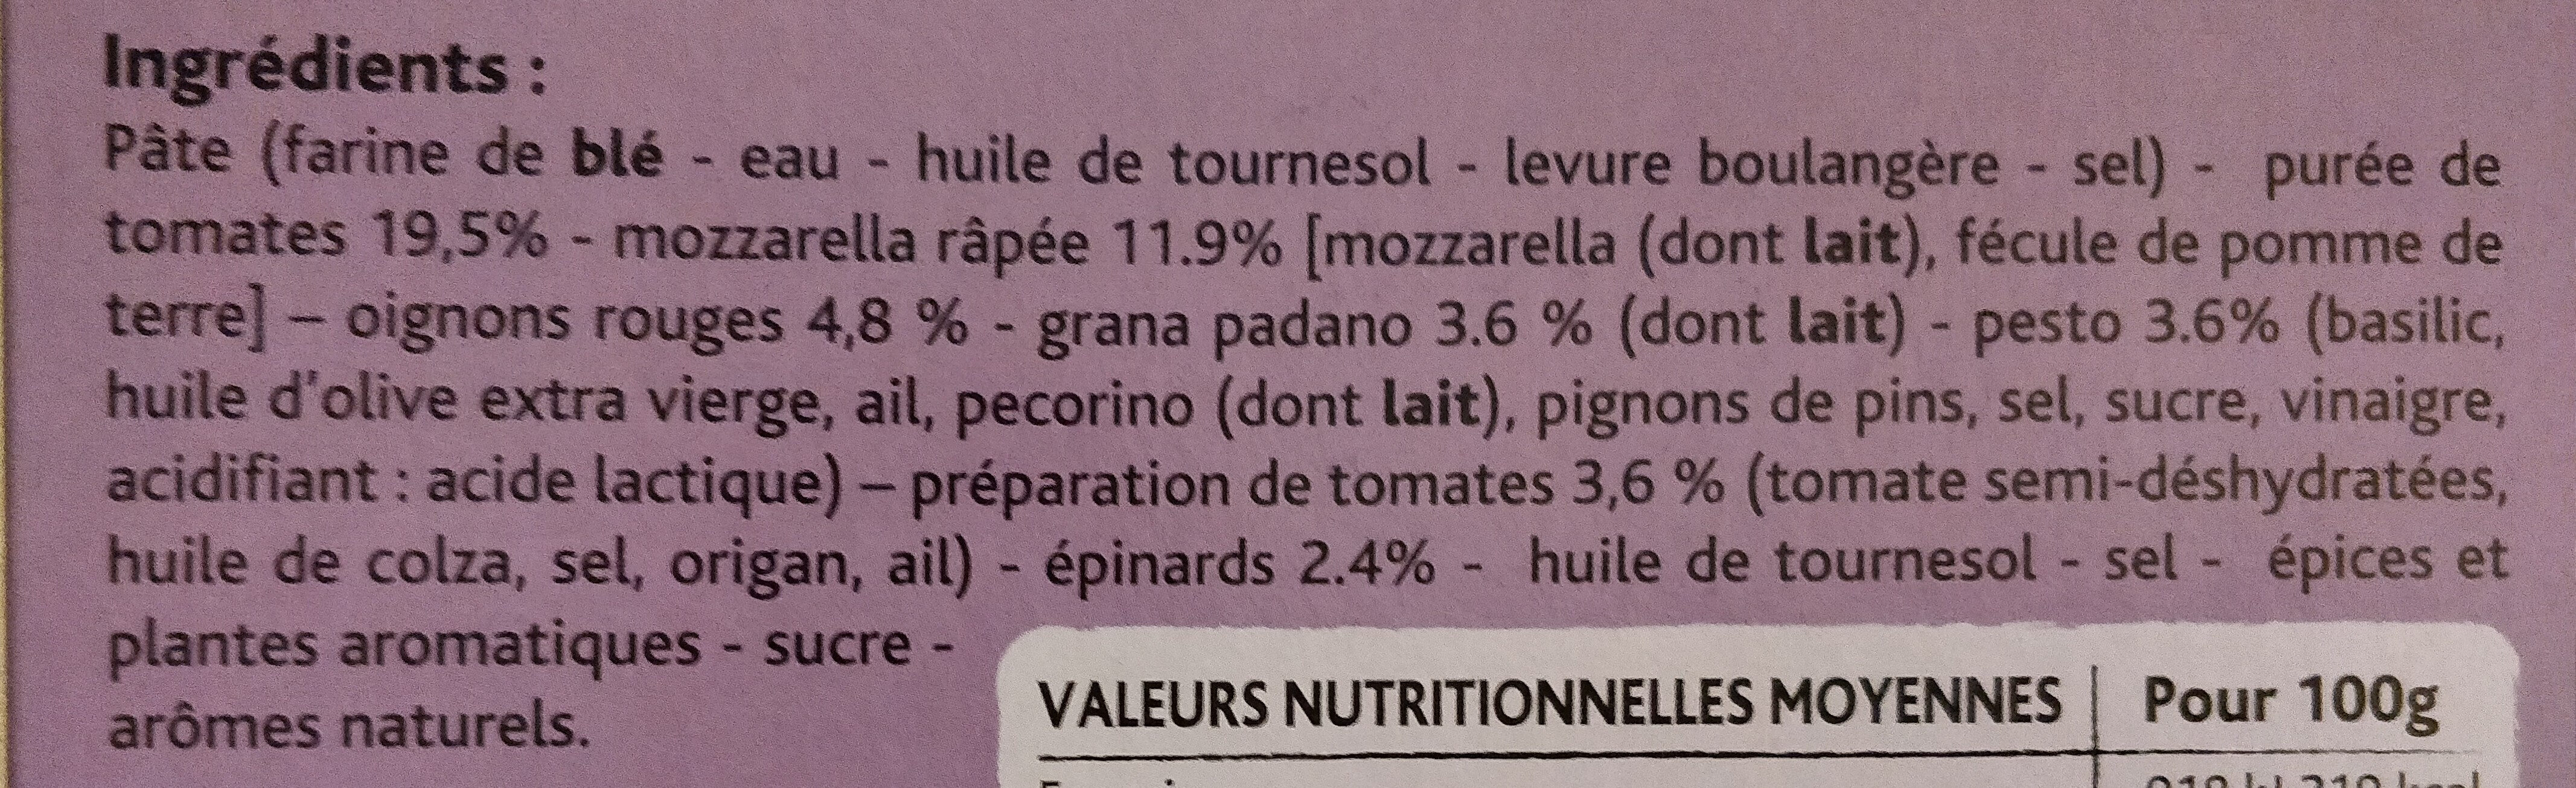 Pizza legumes - grana padano - pesto - Ingredientes